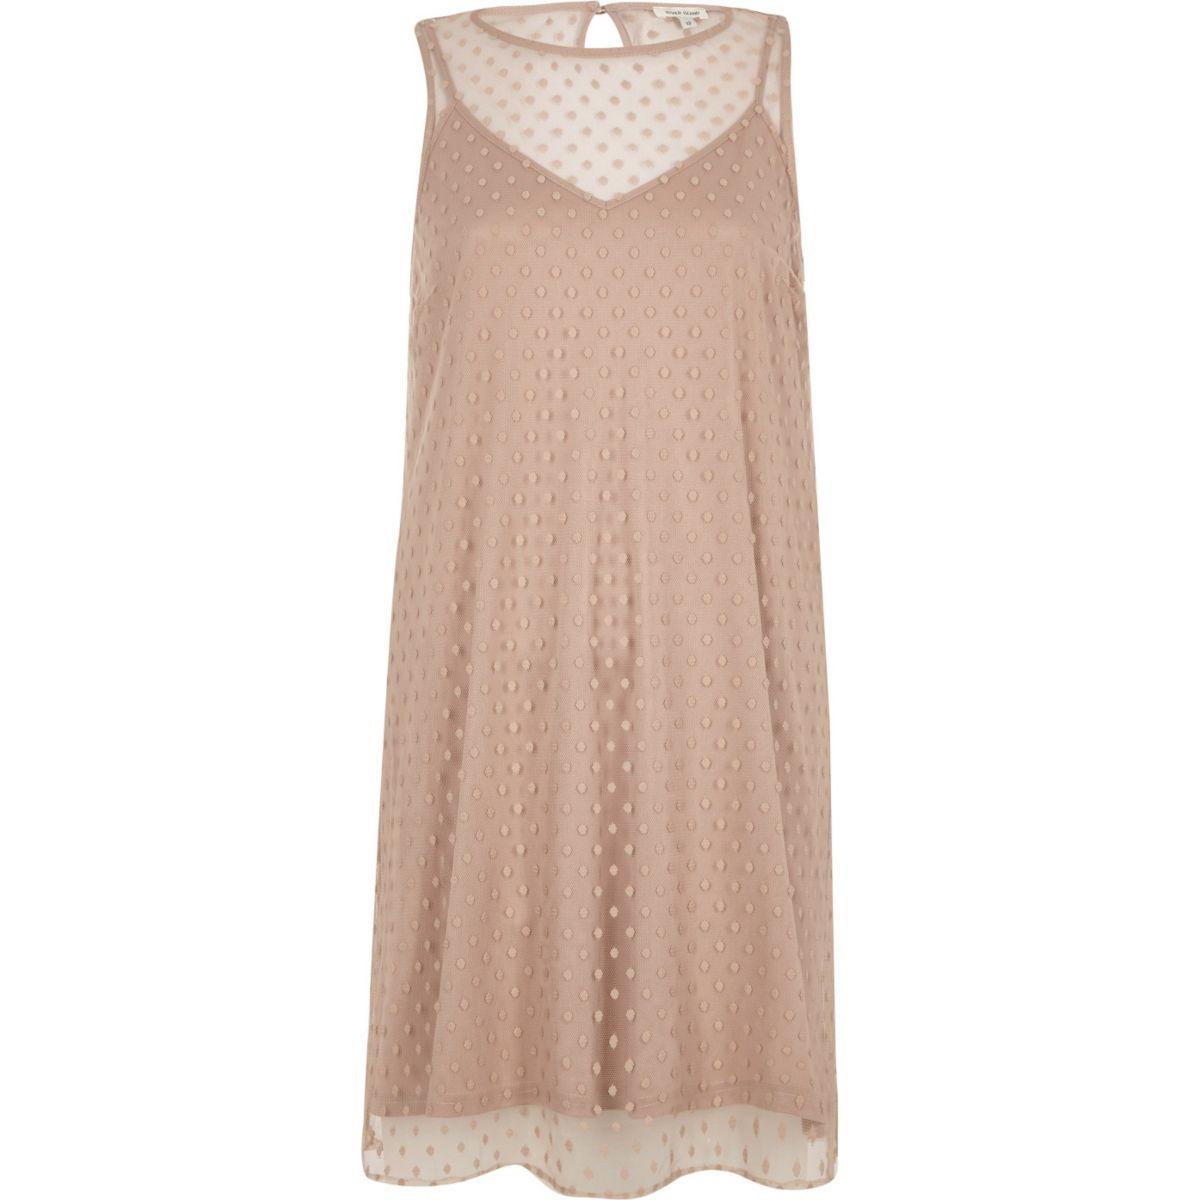 Nude dobby mesh sleeveless dress